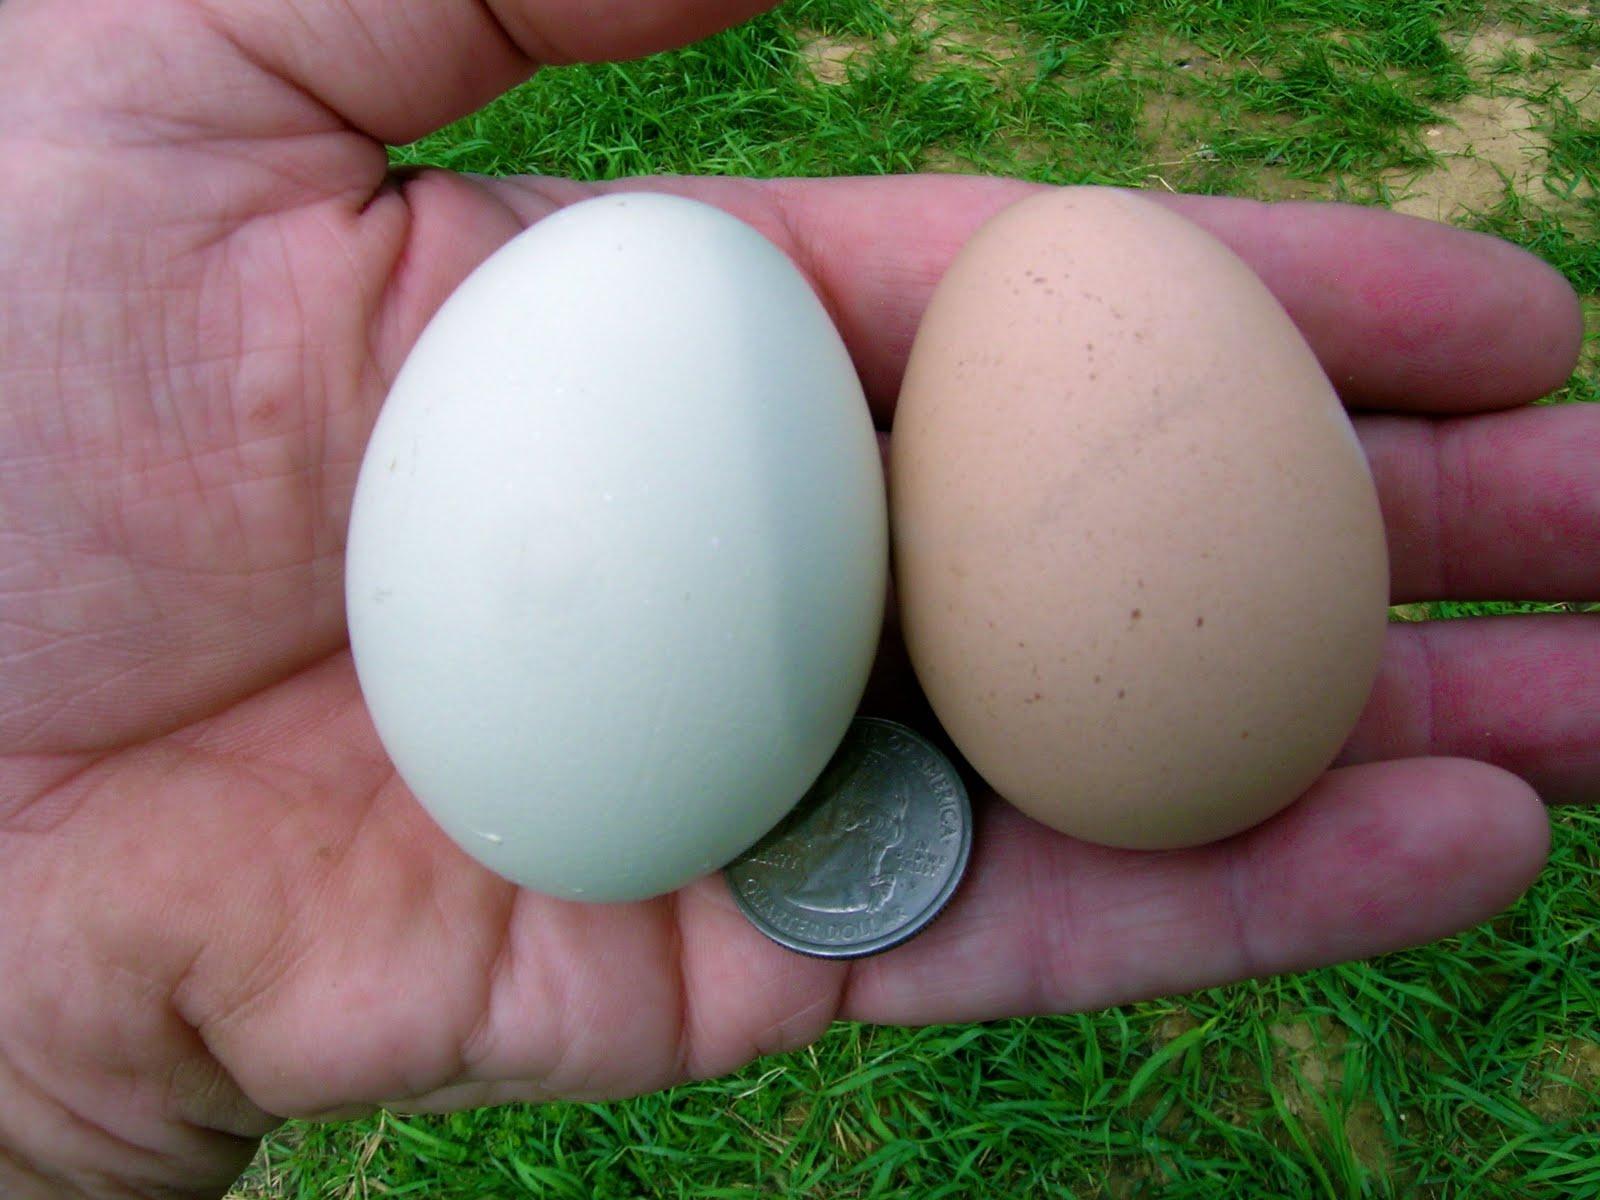 The Badgersett Growers Blog: Free Range Chicken & Guinea Hatching ...